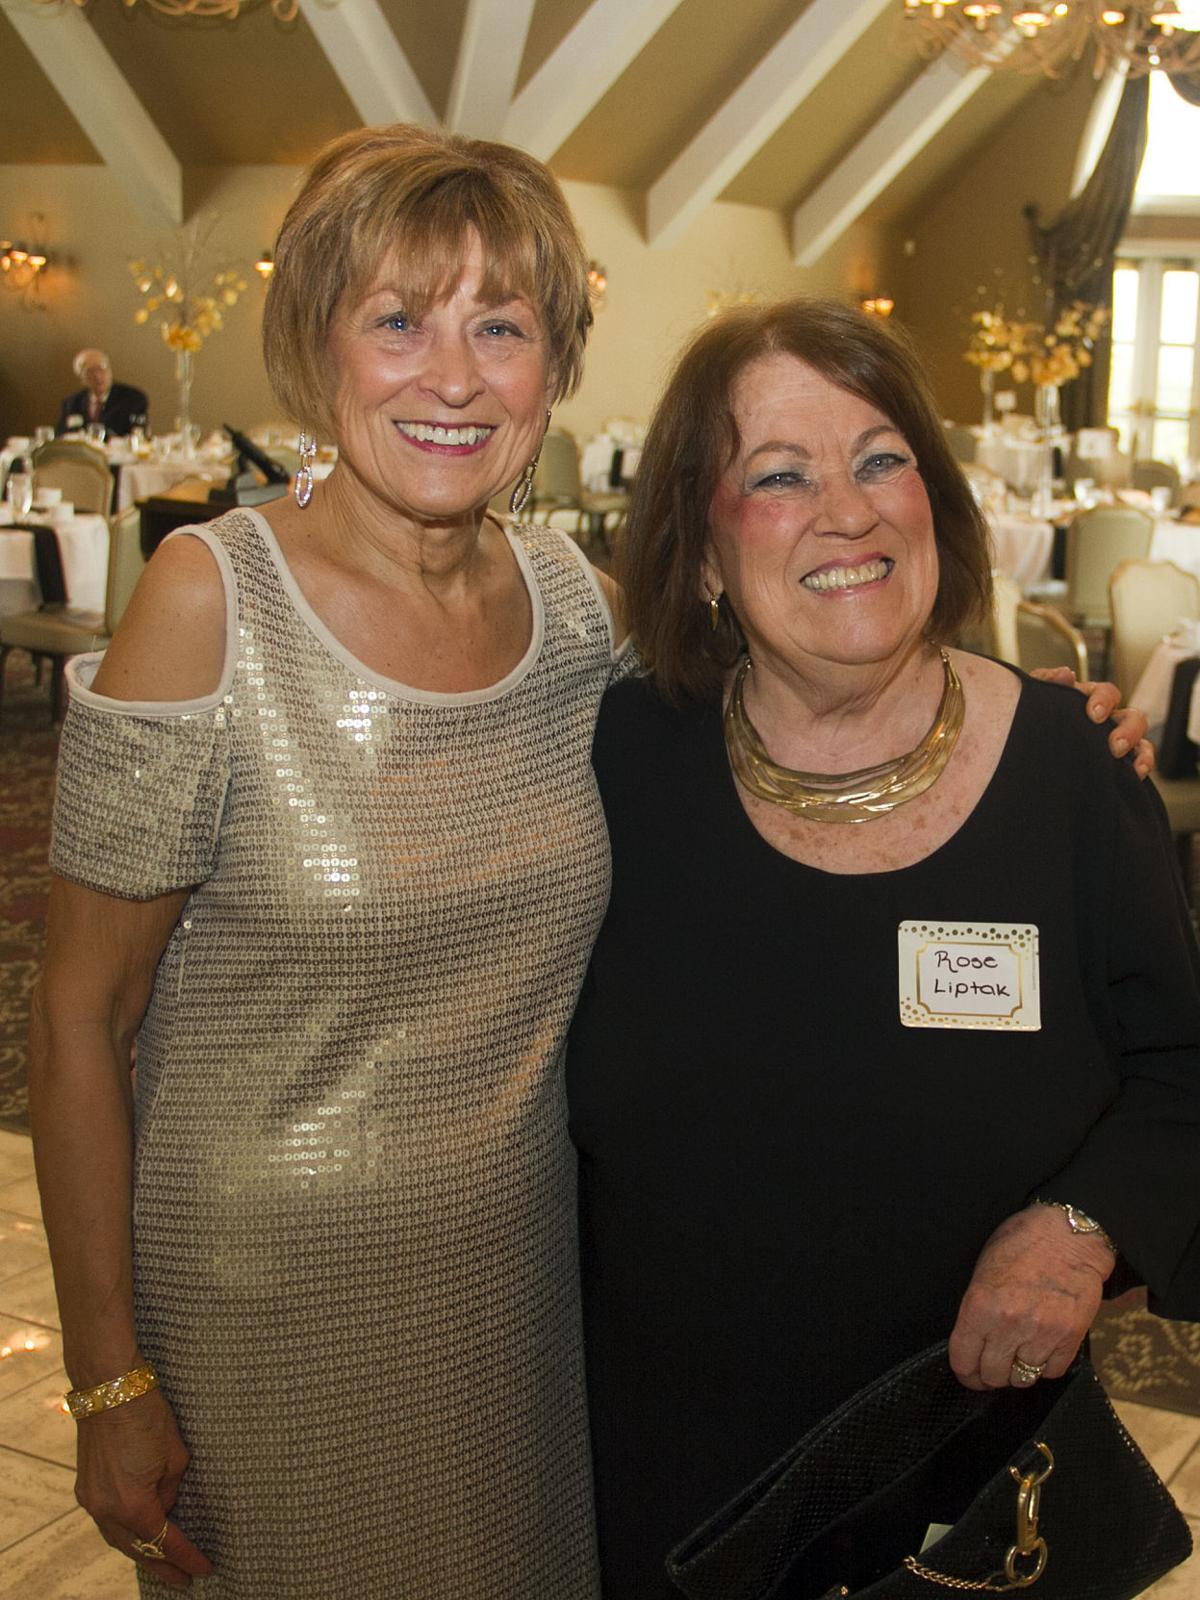 Paula Bongiorno and Rose Liptak